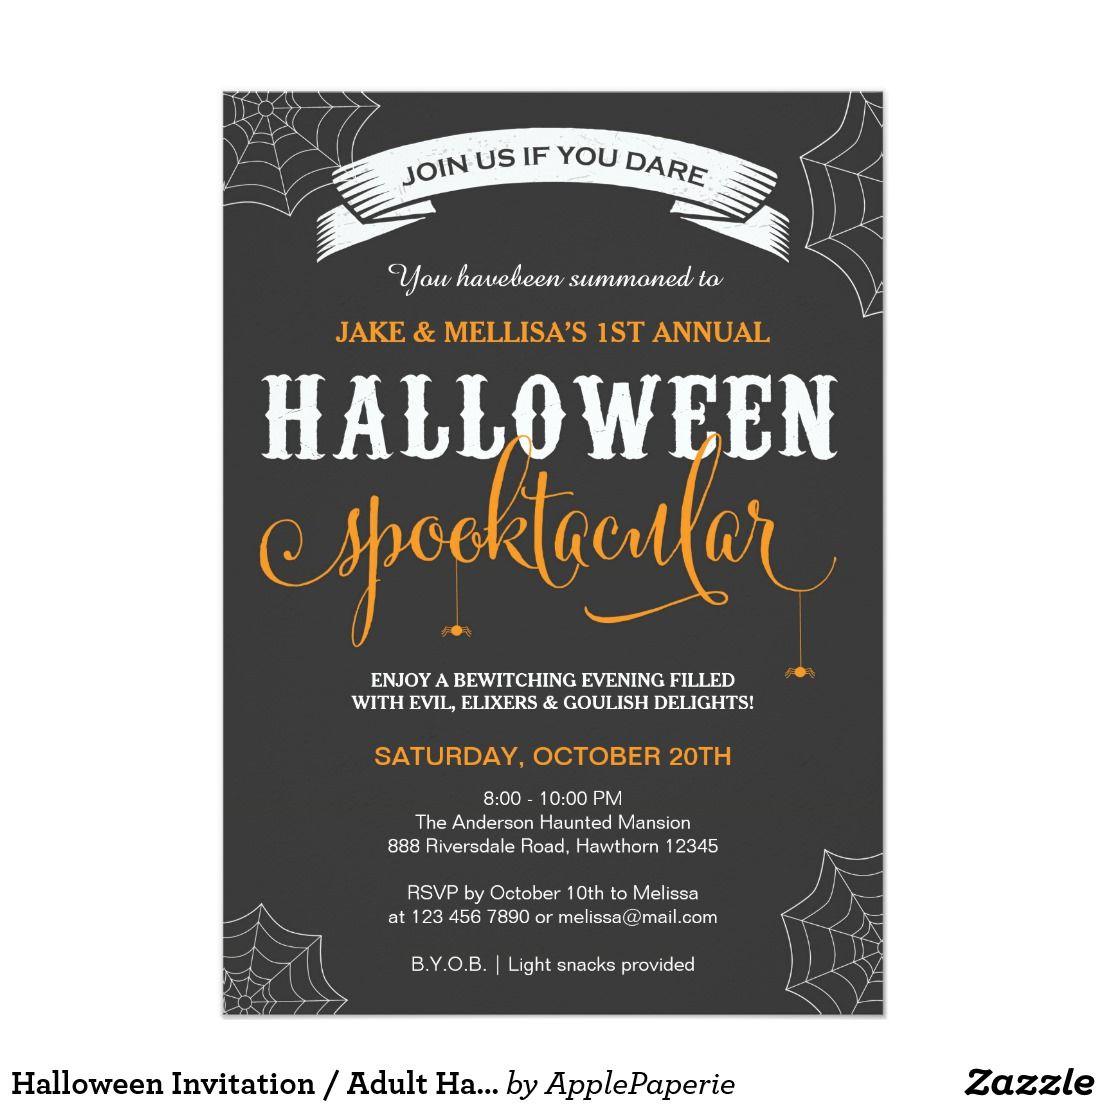 Halloween Invitation / Adult Halloween Party   Adult halloween party ...